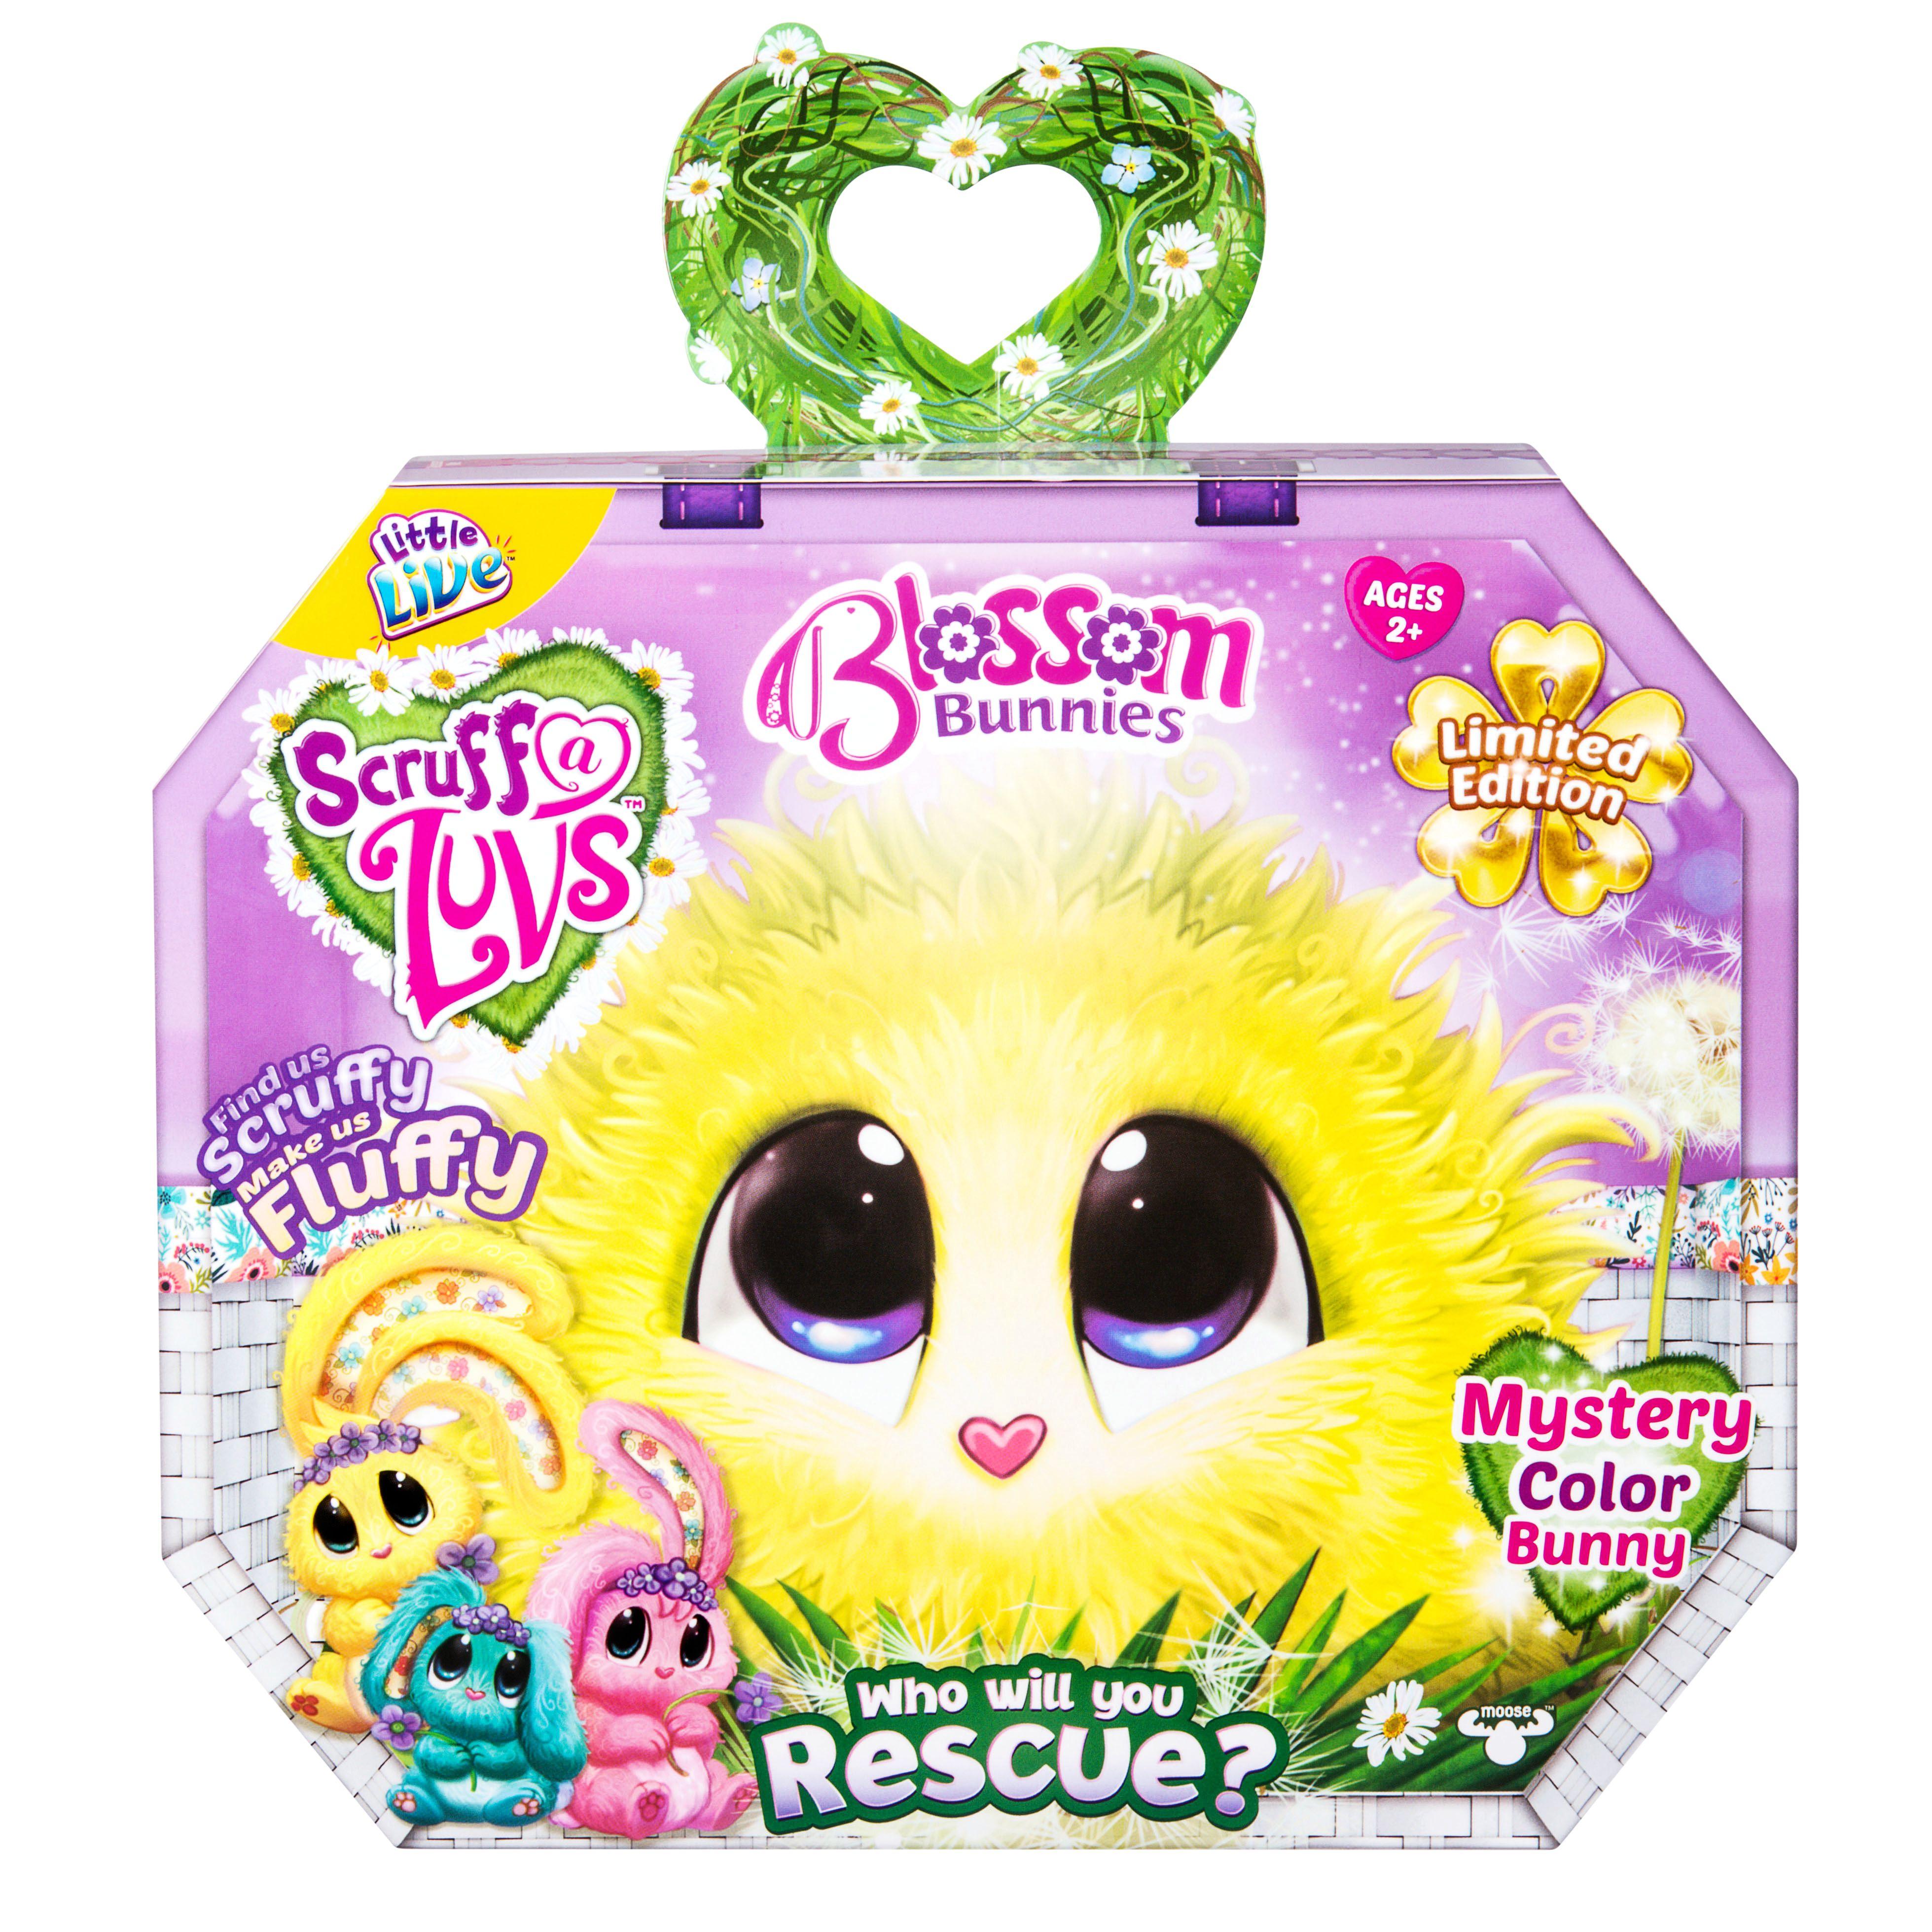 Gift Idea Free Little Live Scruff A Luvs From Walmart 13 Value Exp 11 17 19 Free Freeafterrebate Freestuff Free Little Live Pets Bunny Luvs